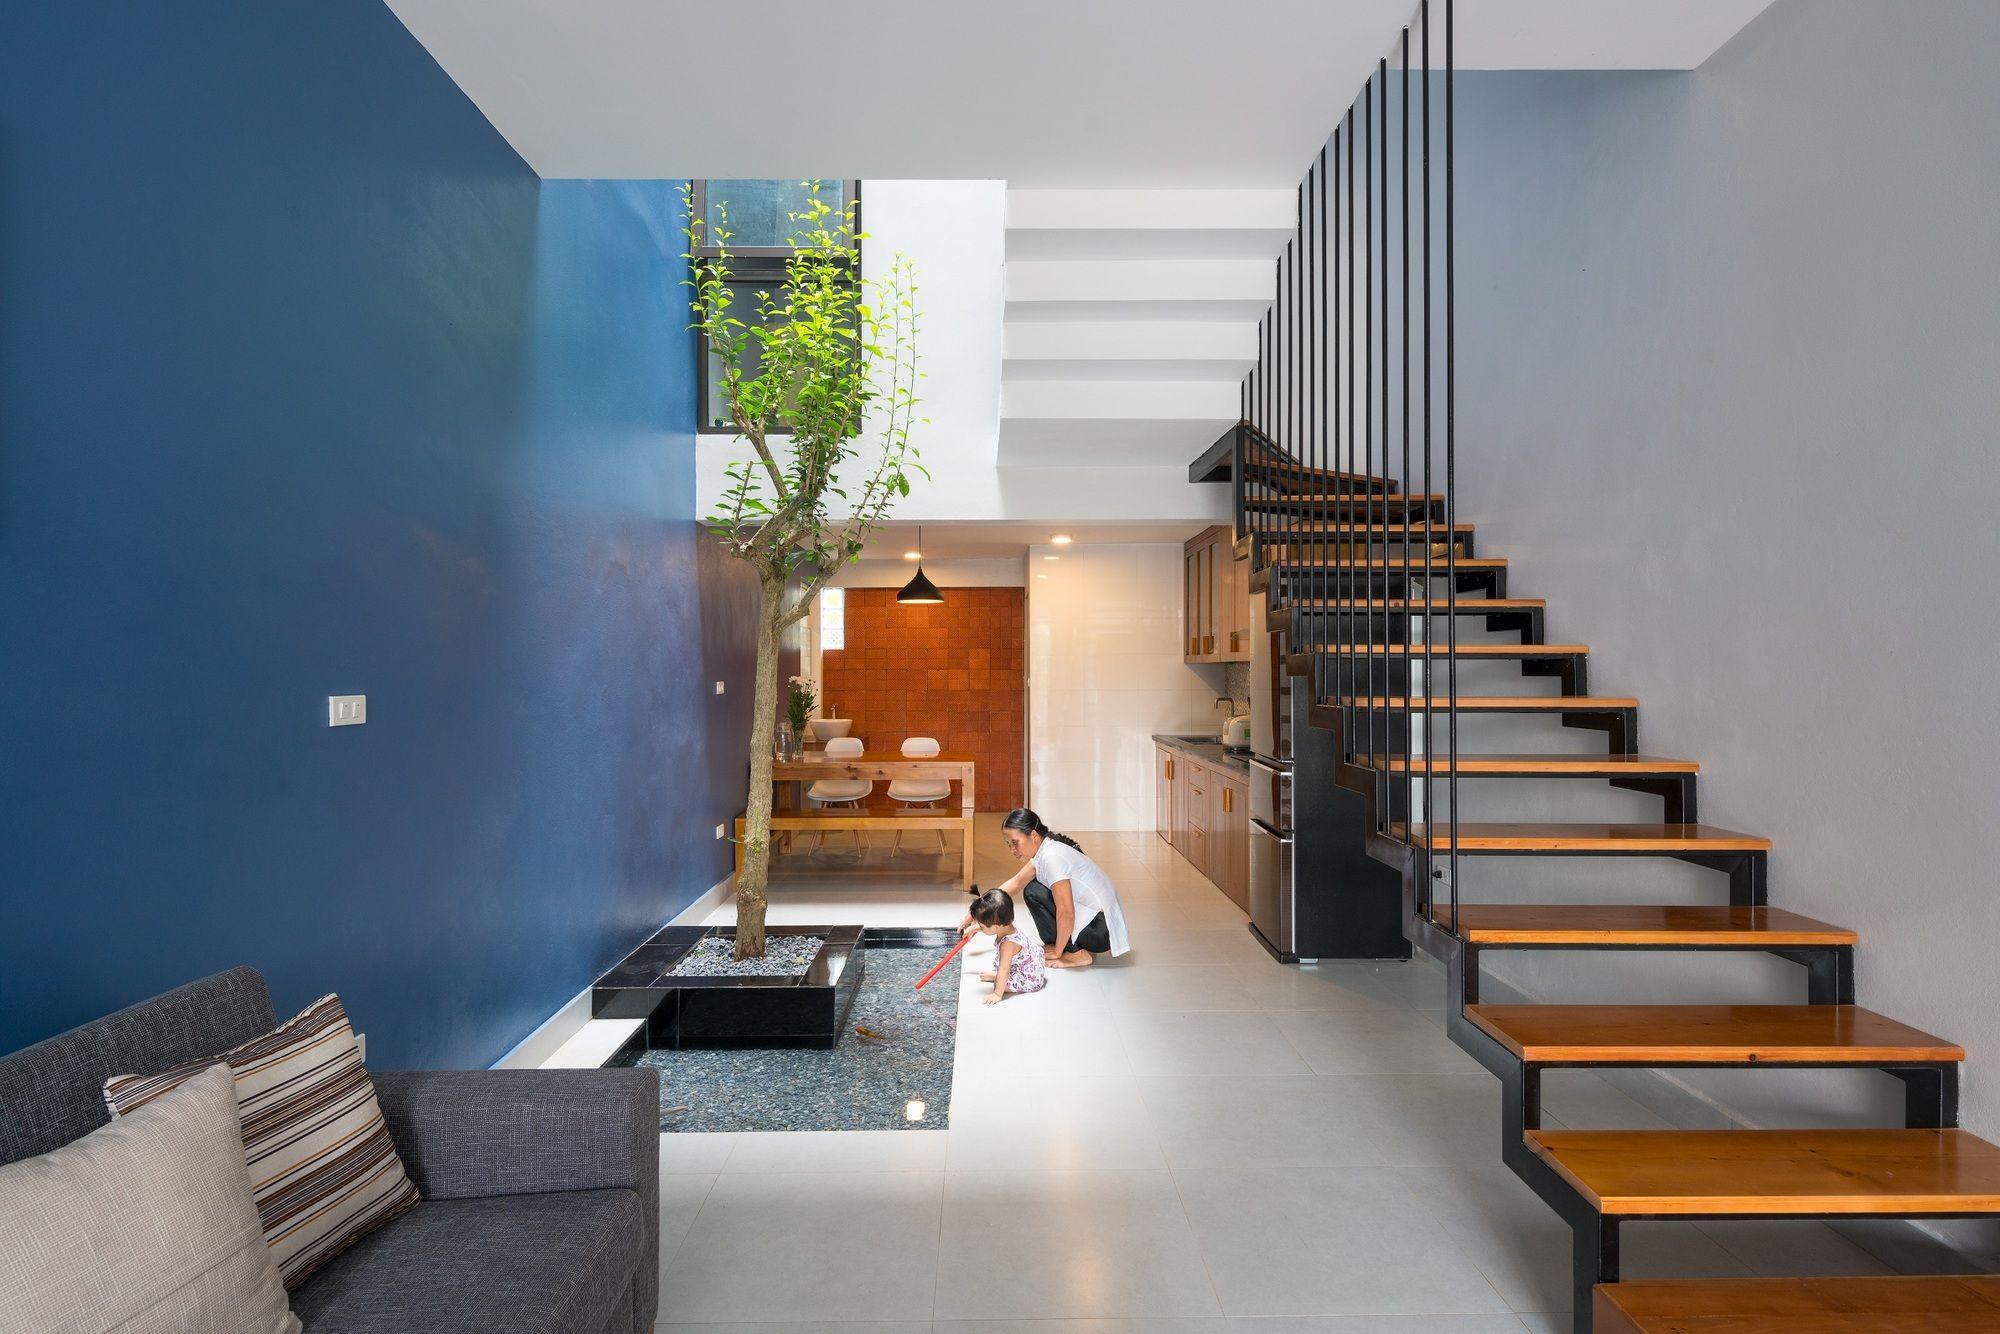 Đàm lộc House / V+studio | Studio, House and Architecture